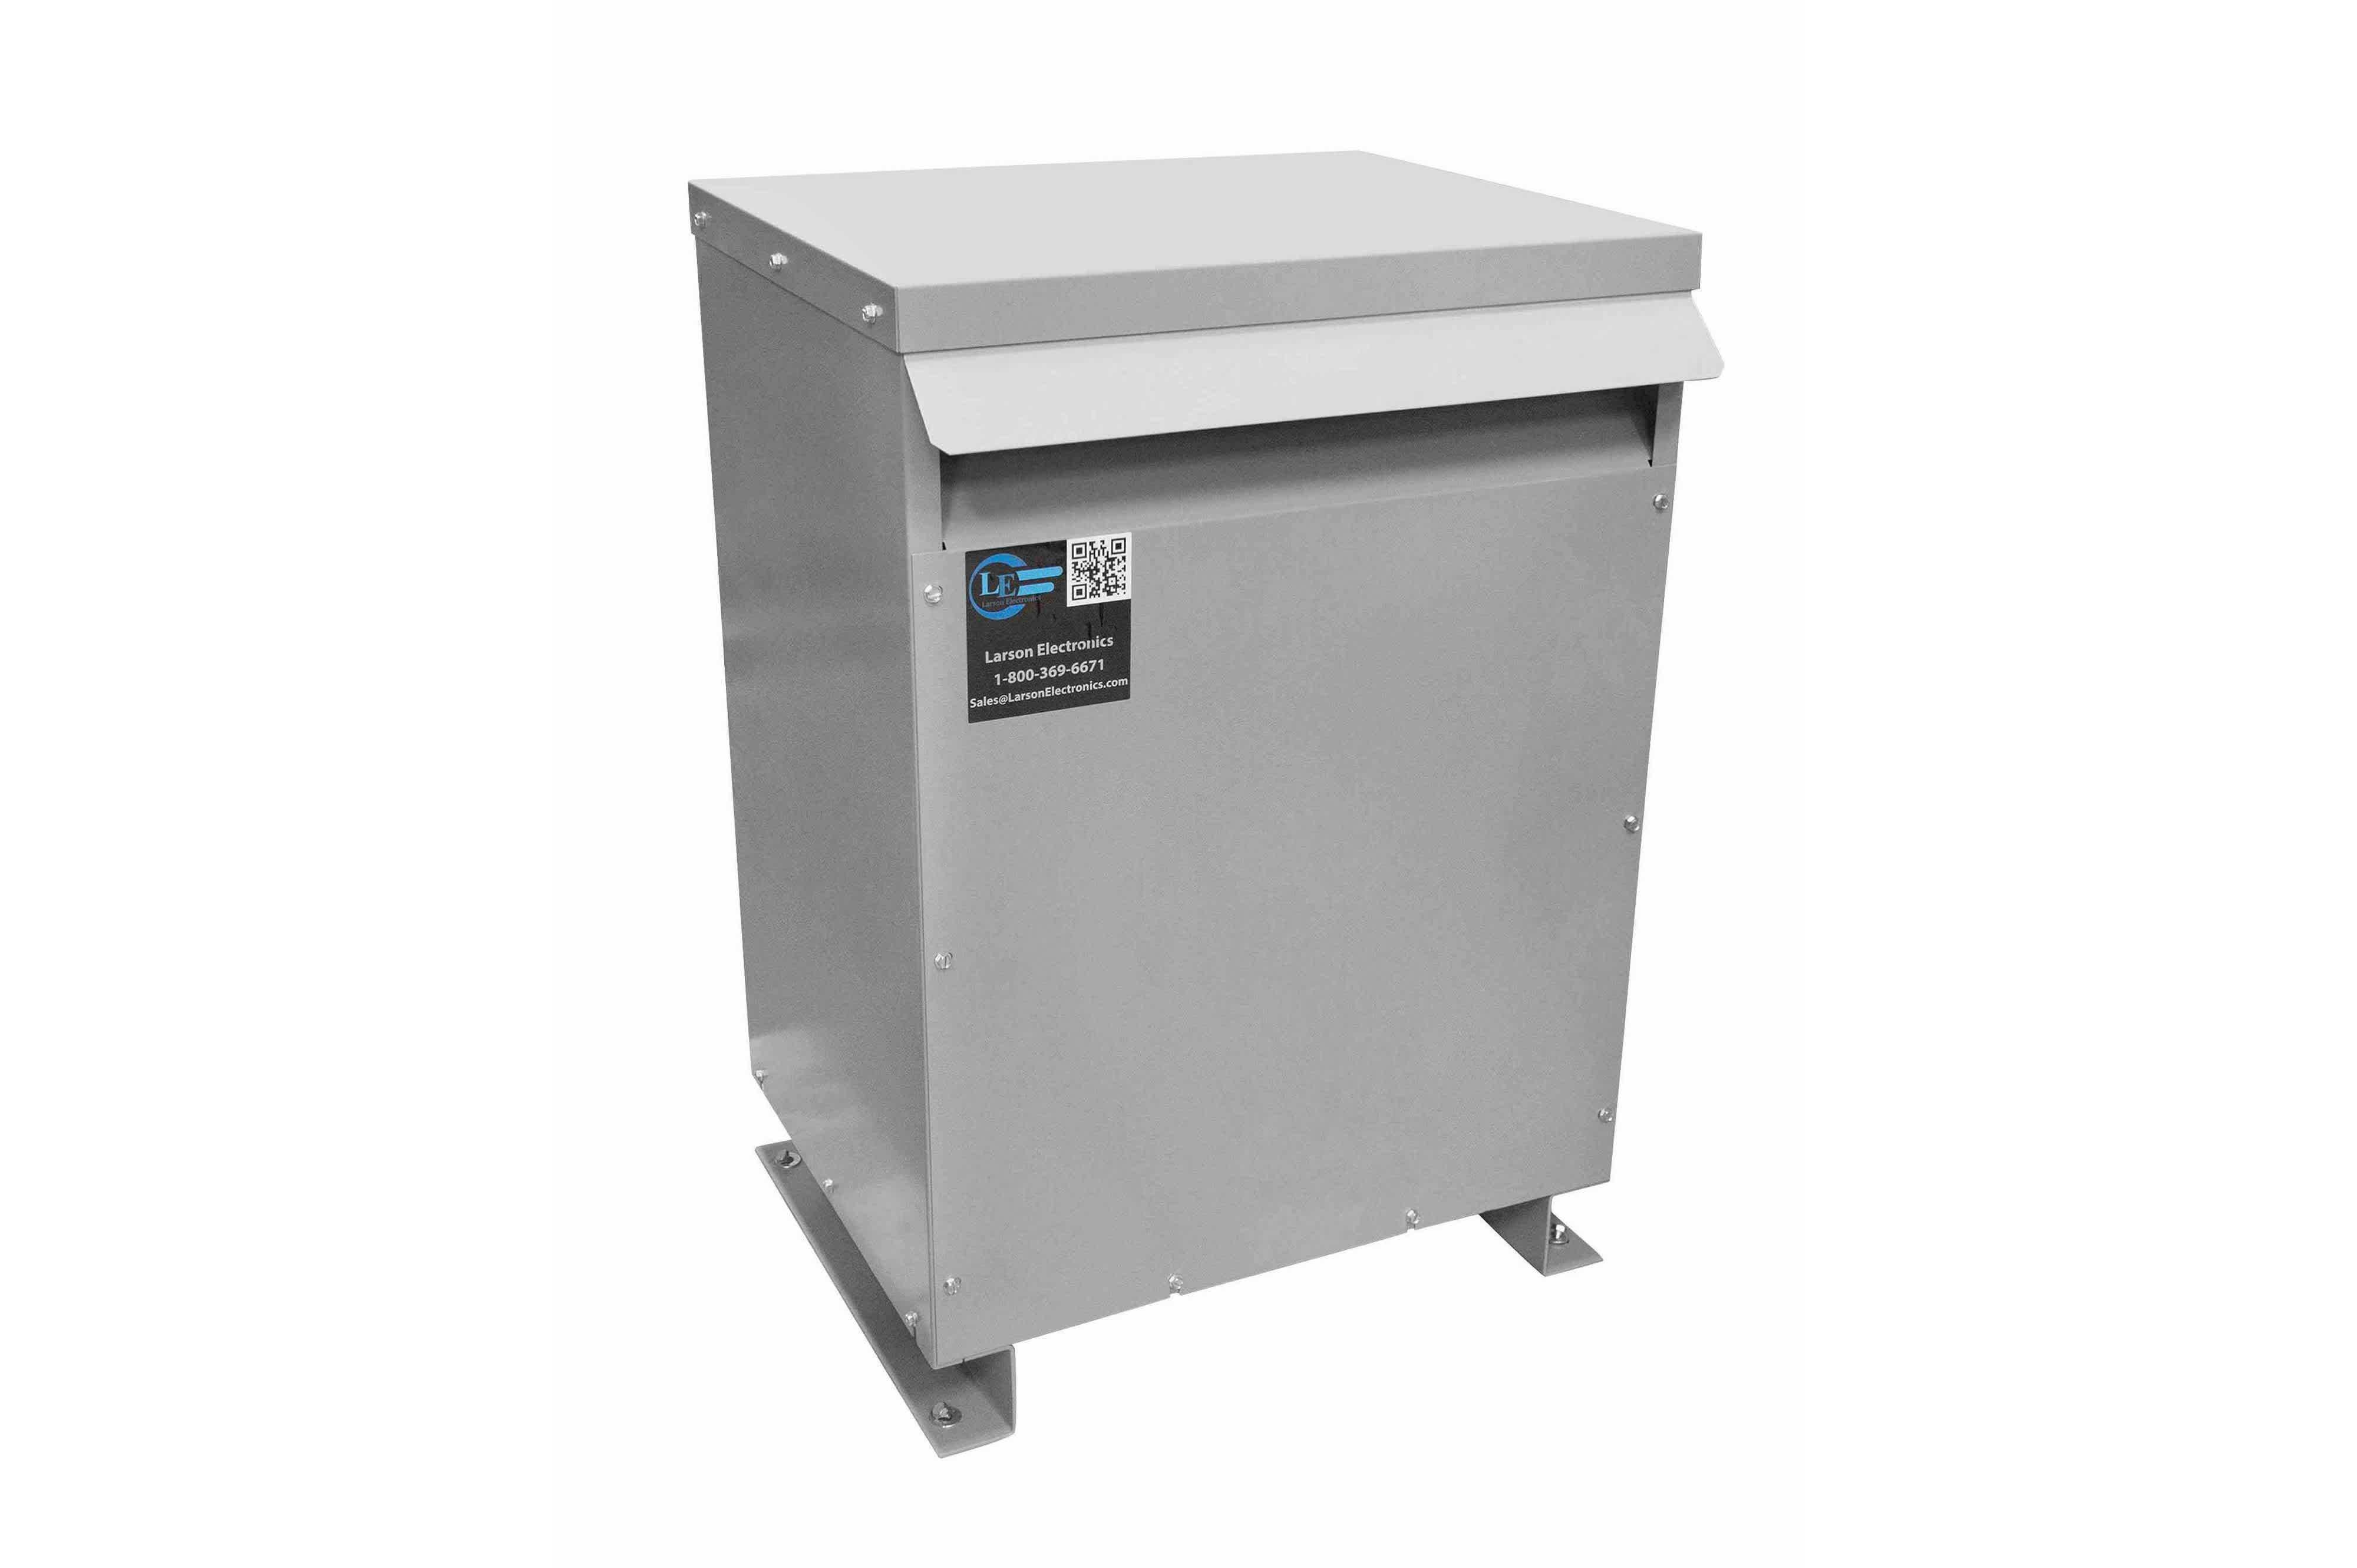 52.5 kVA 3PH Isolation Transformer, 208V Wye Primary, 480V Delta Secondary, N3R, Ventilated, 60 Hz